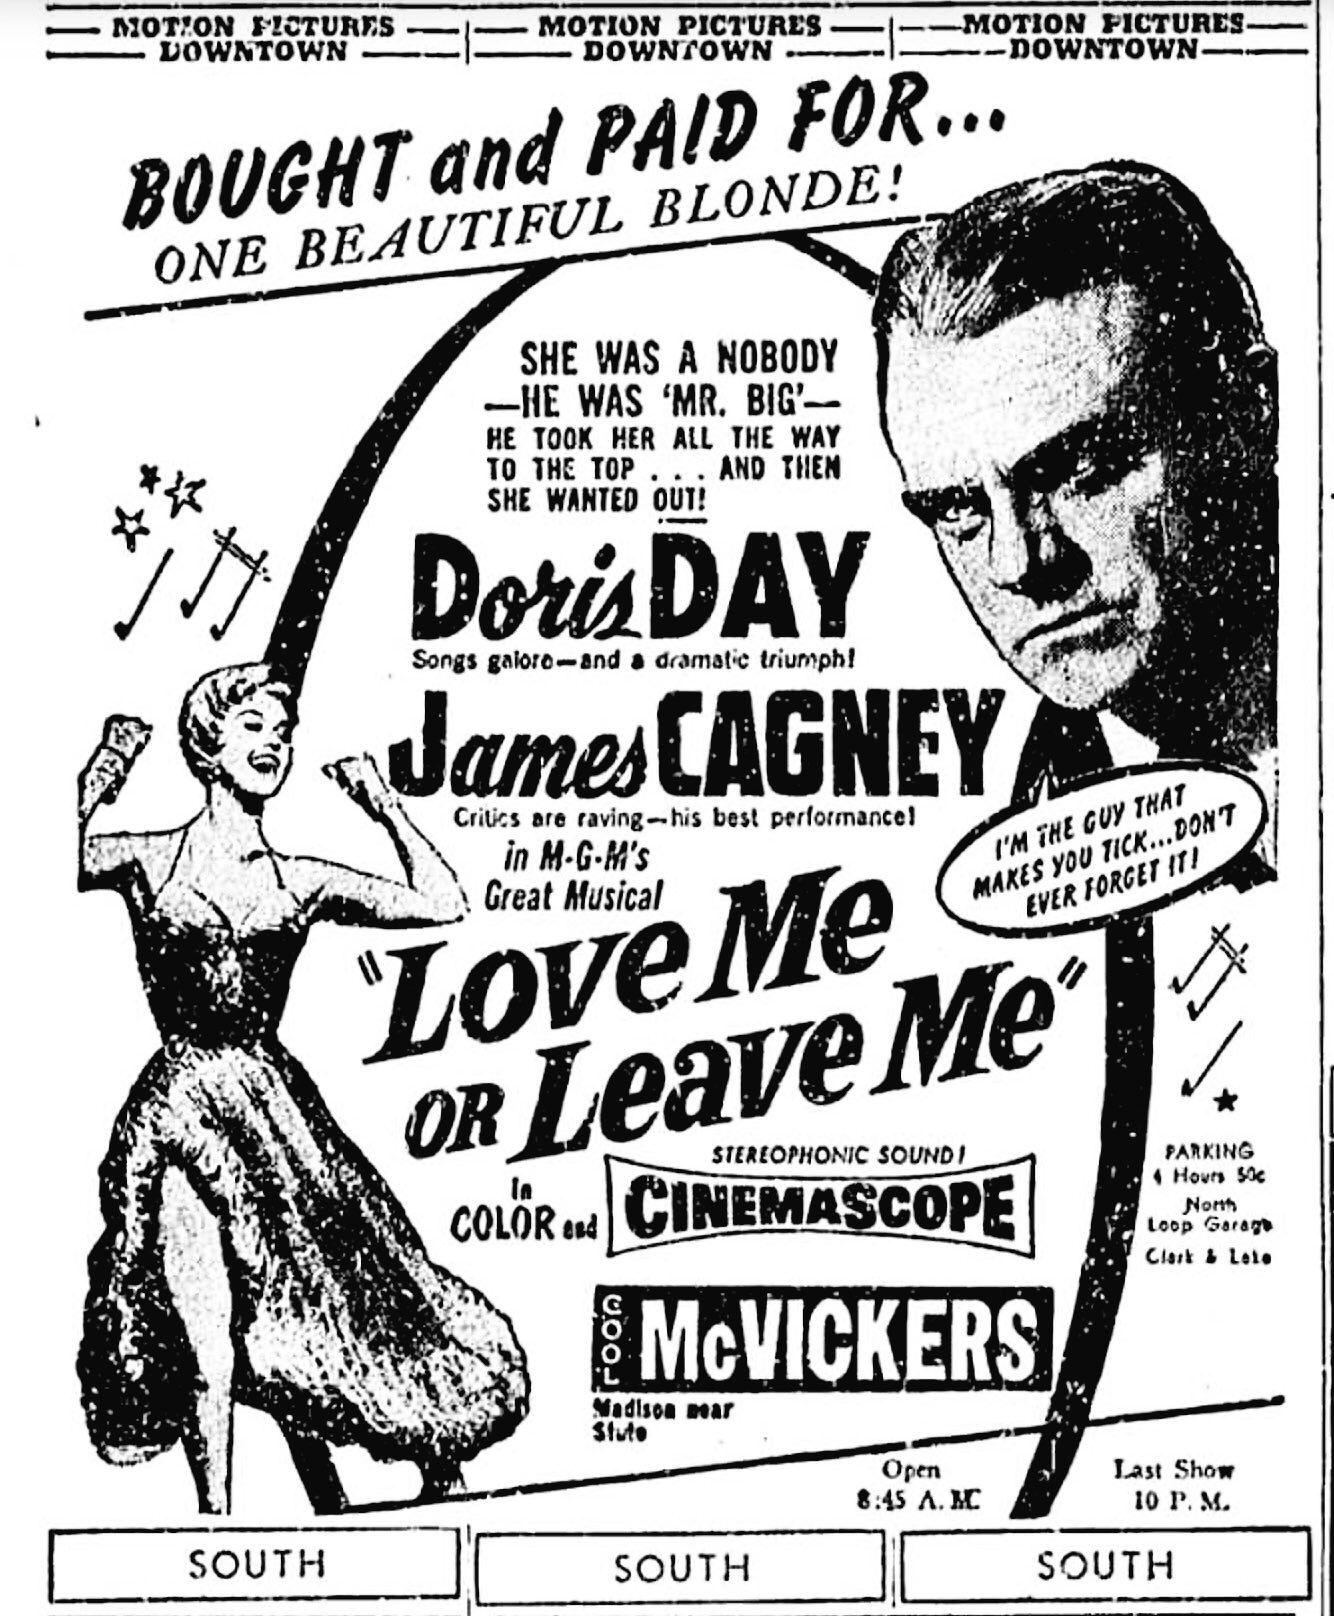 love me or leave me 1955 7 29 1955 chicago tribune james 1955 MG Car love me or leave me 1955 7 29 1955 chicago tribune